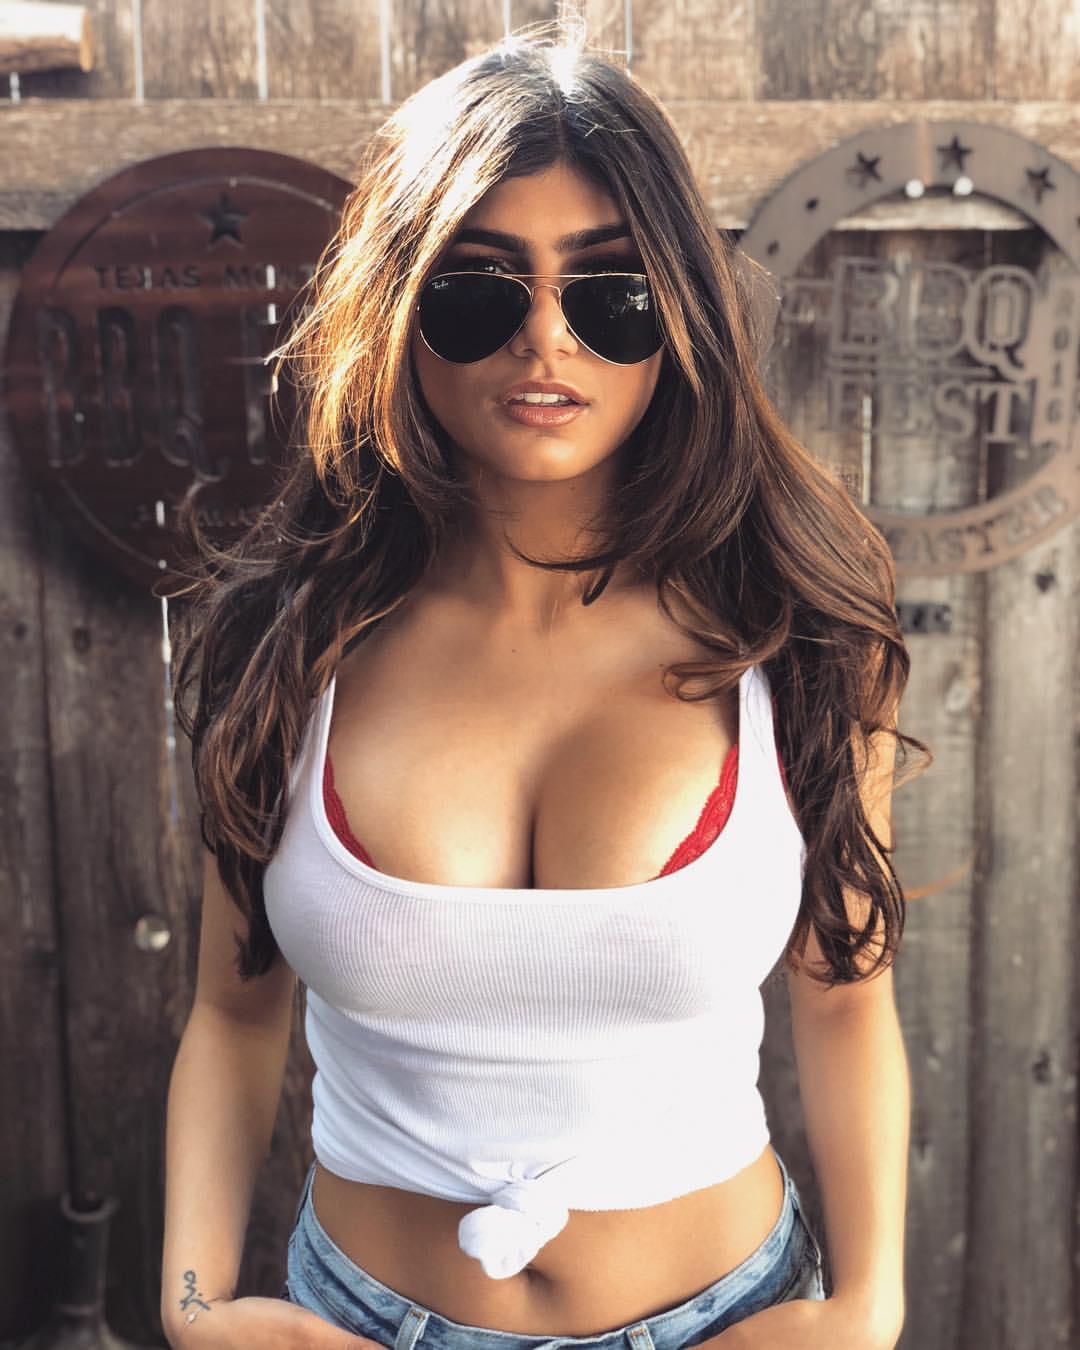 350 best Mia Khalifa images on Pinterest | Female bodies